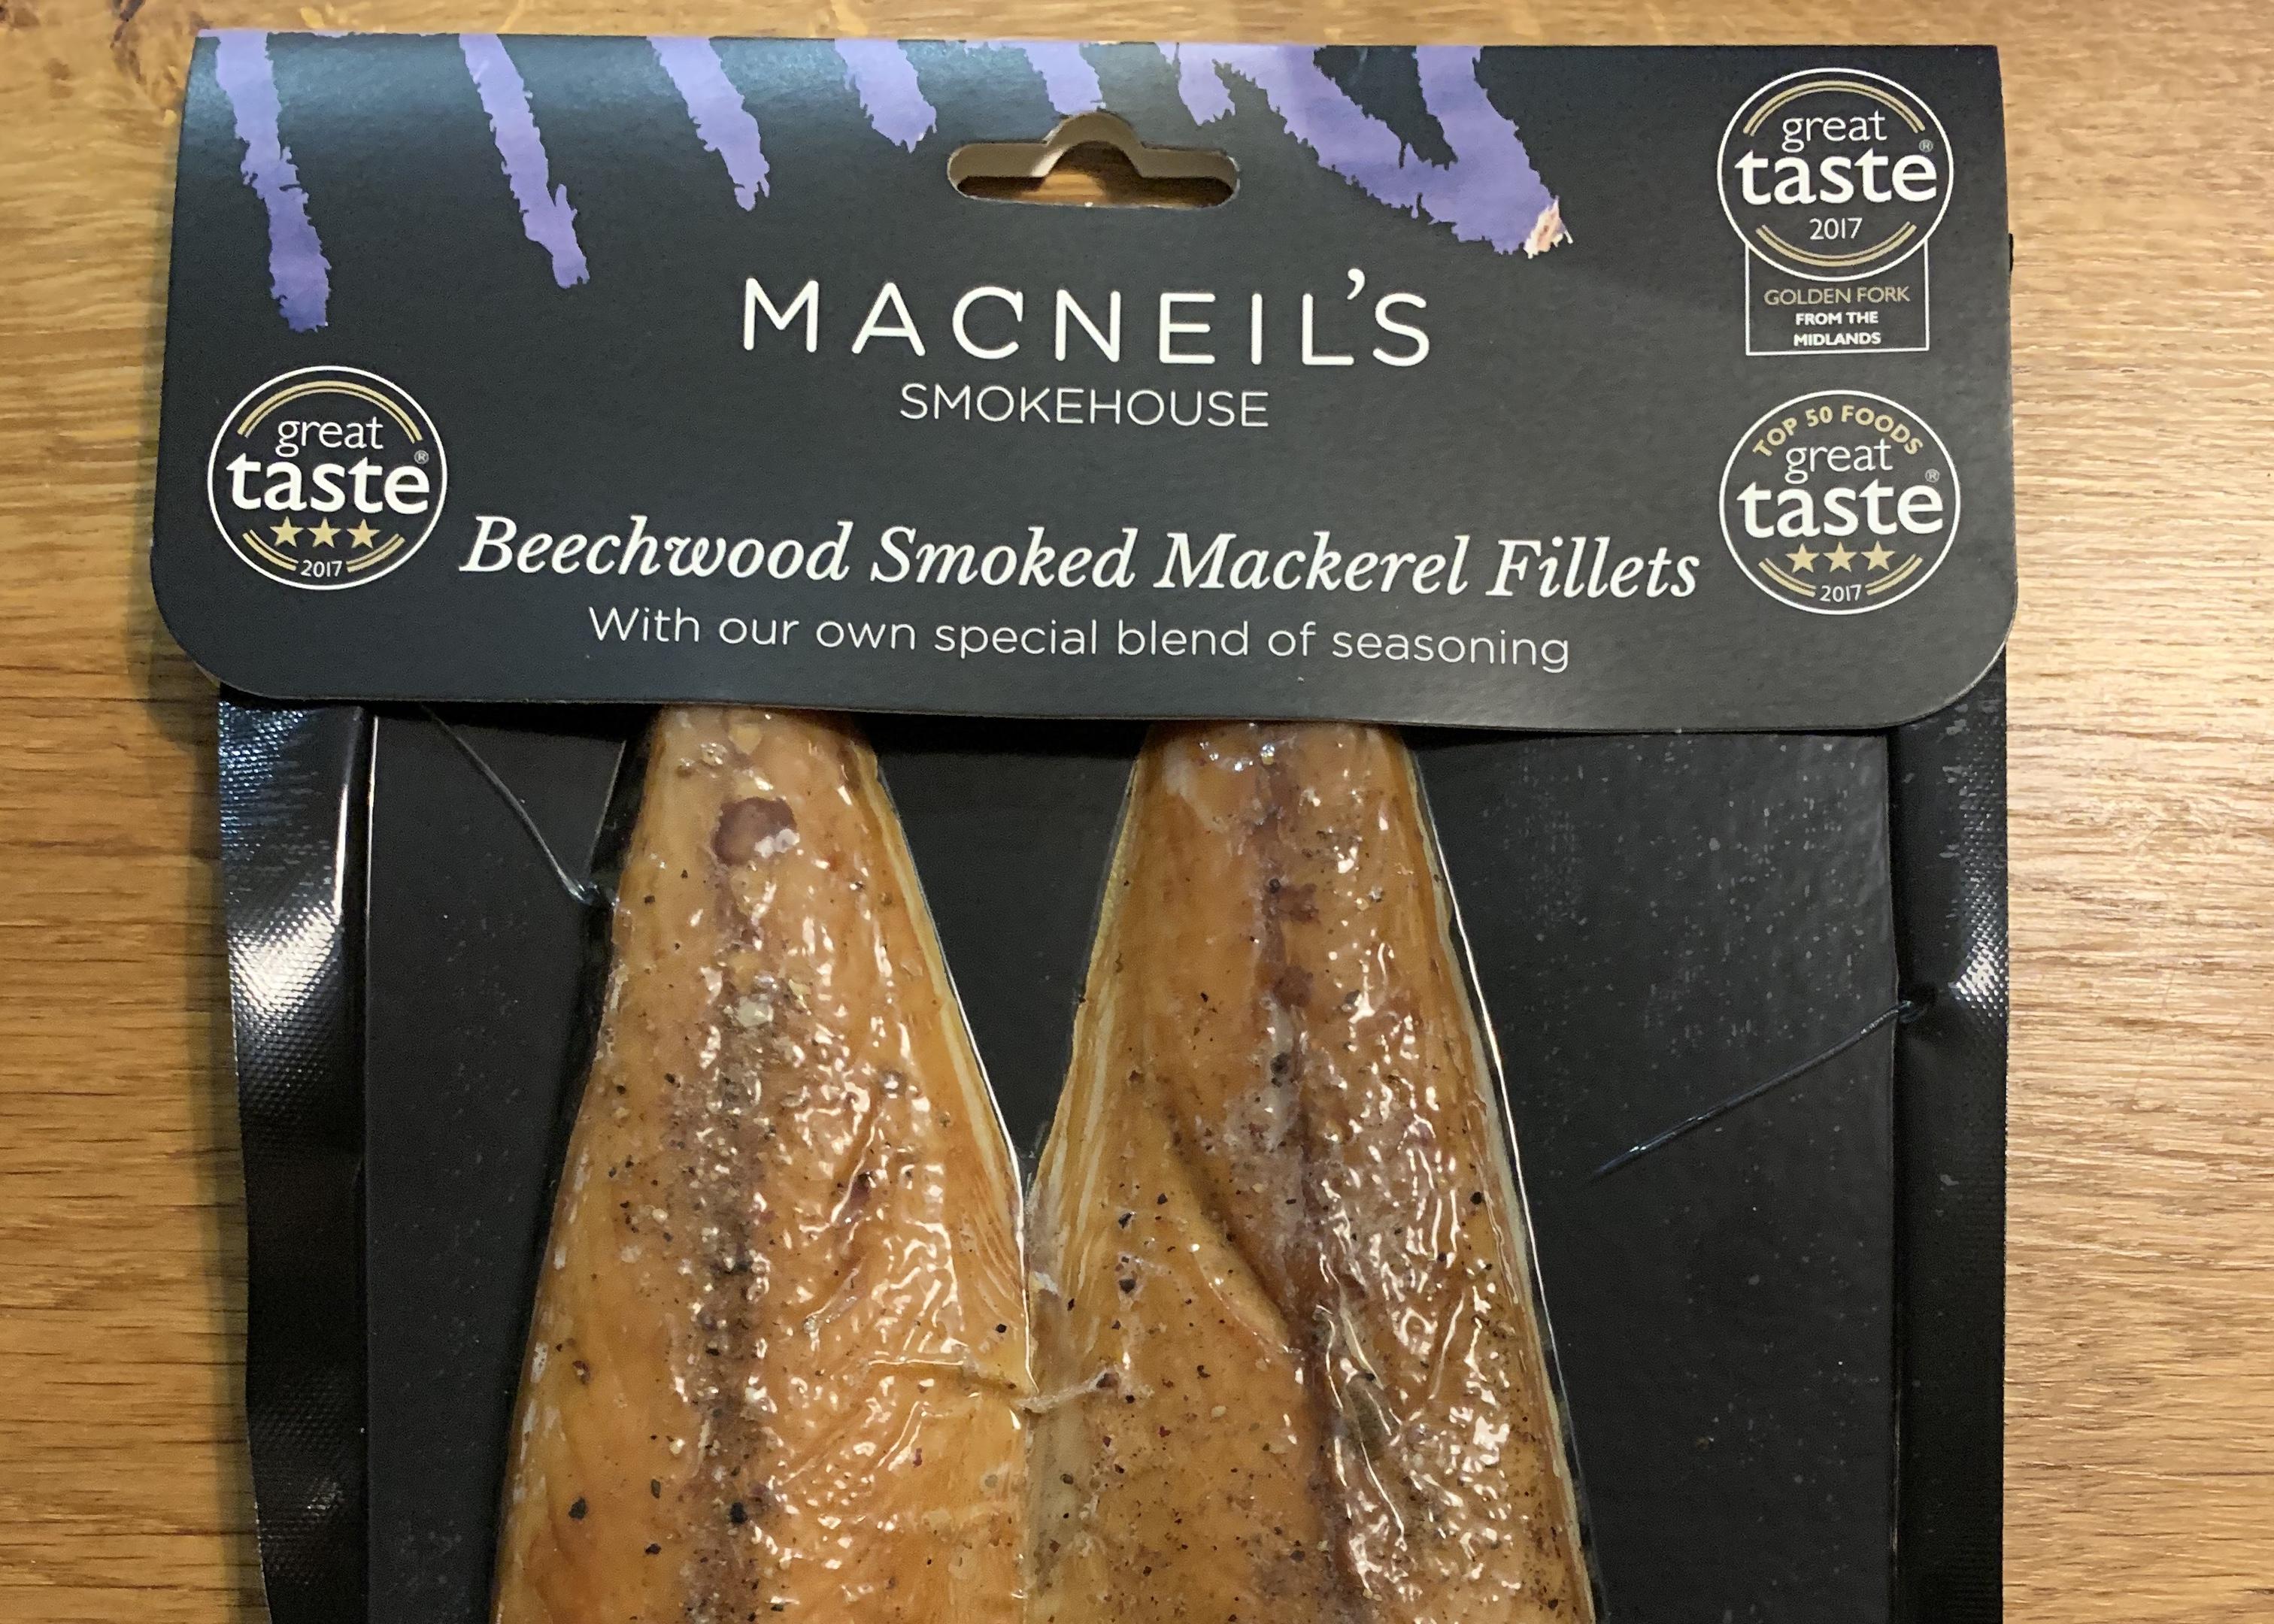 Macneil's Smokehouse - Peppered Mackerel